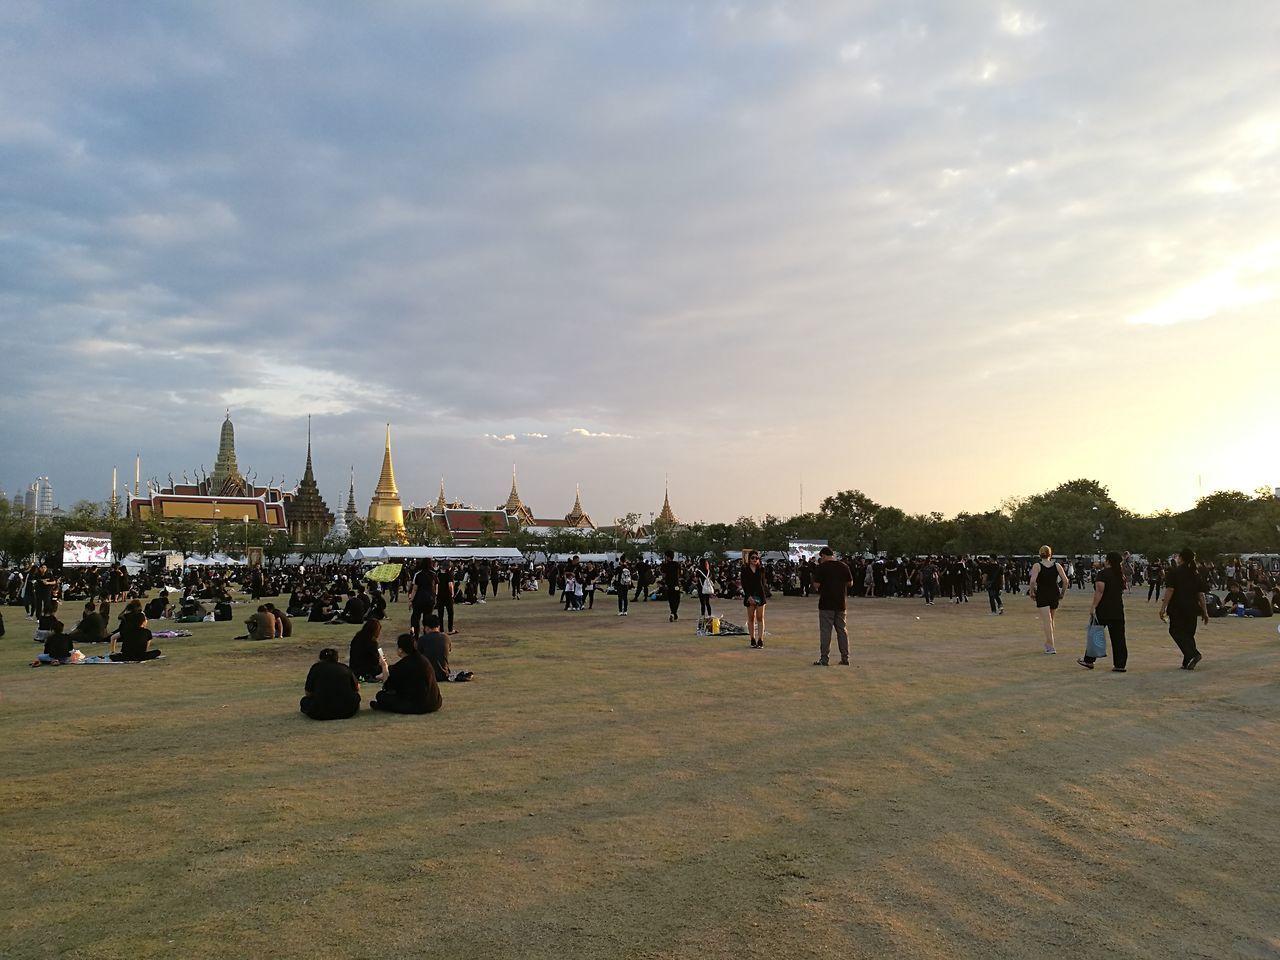 City Sky People Day Sunset Cultures Lifes Nature สนามหลวง ฉันเกิดในรัชกาลที่ ๙ ขอเป็นข้ารองพระบาททุกชาติไป ฉันรักประเทศไทย สยามเมืองยิ้ม